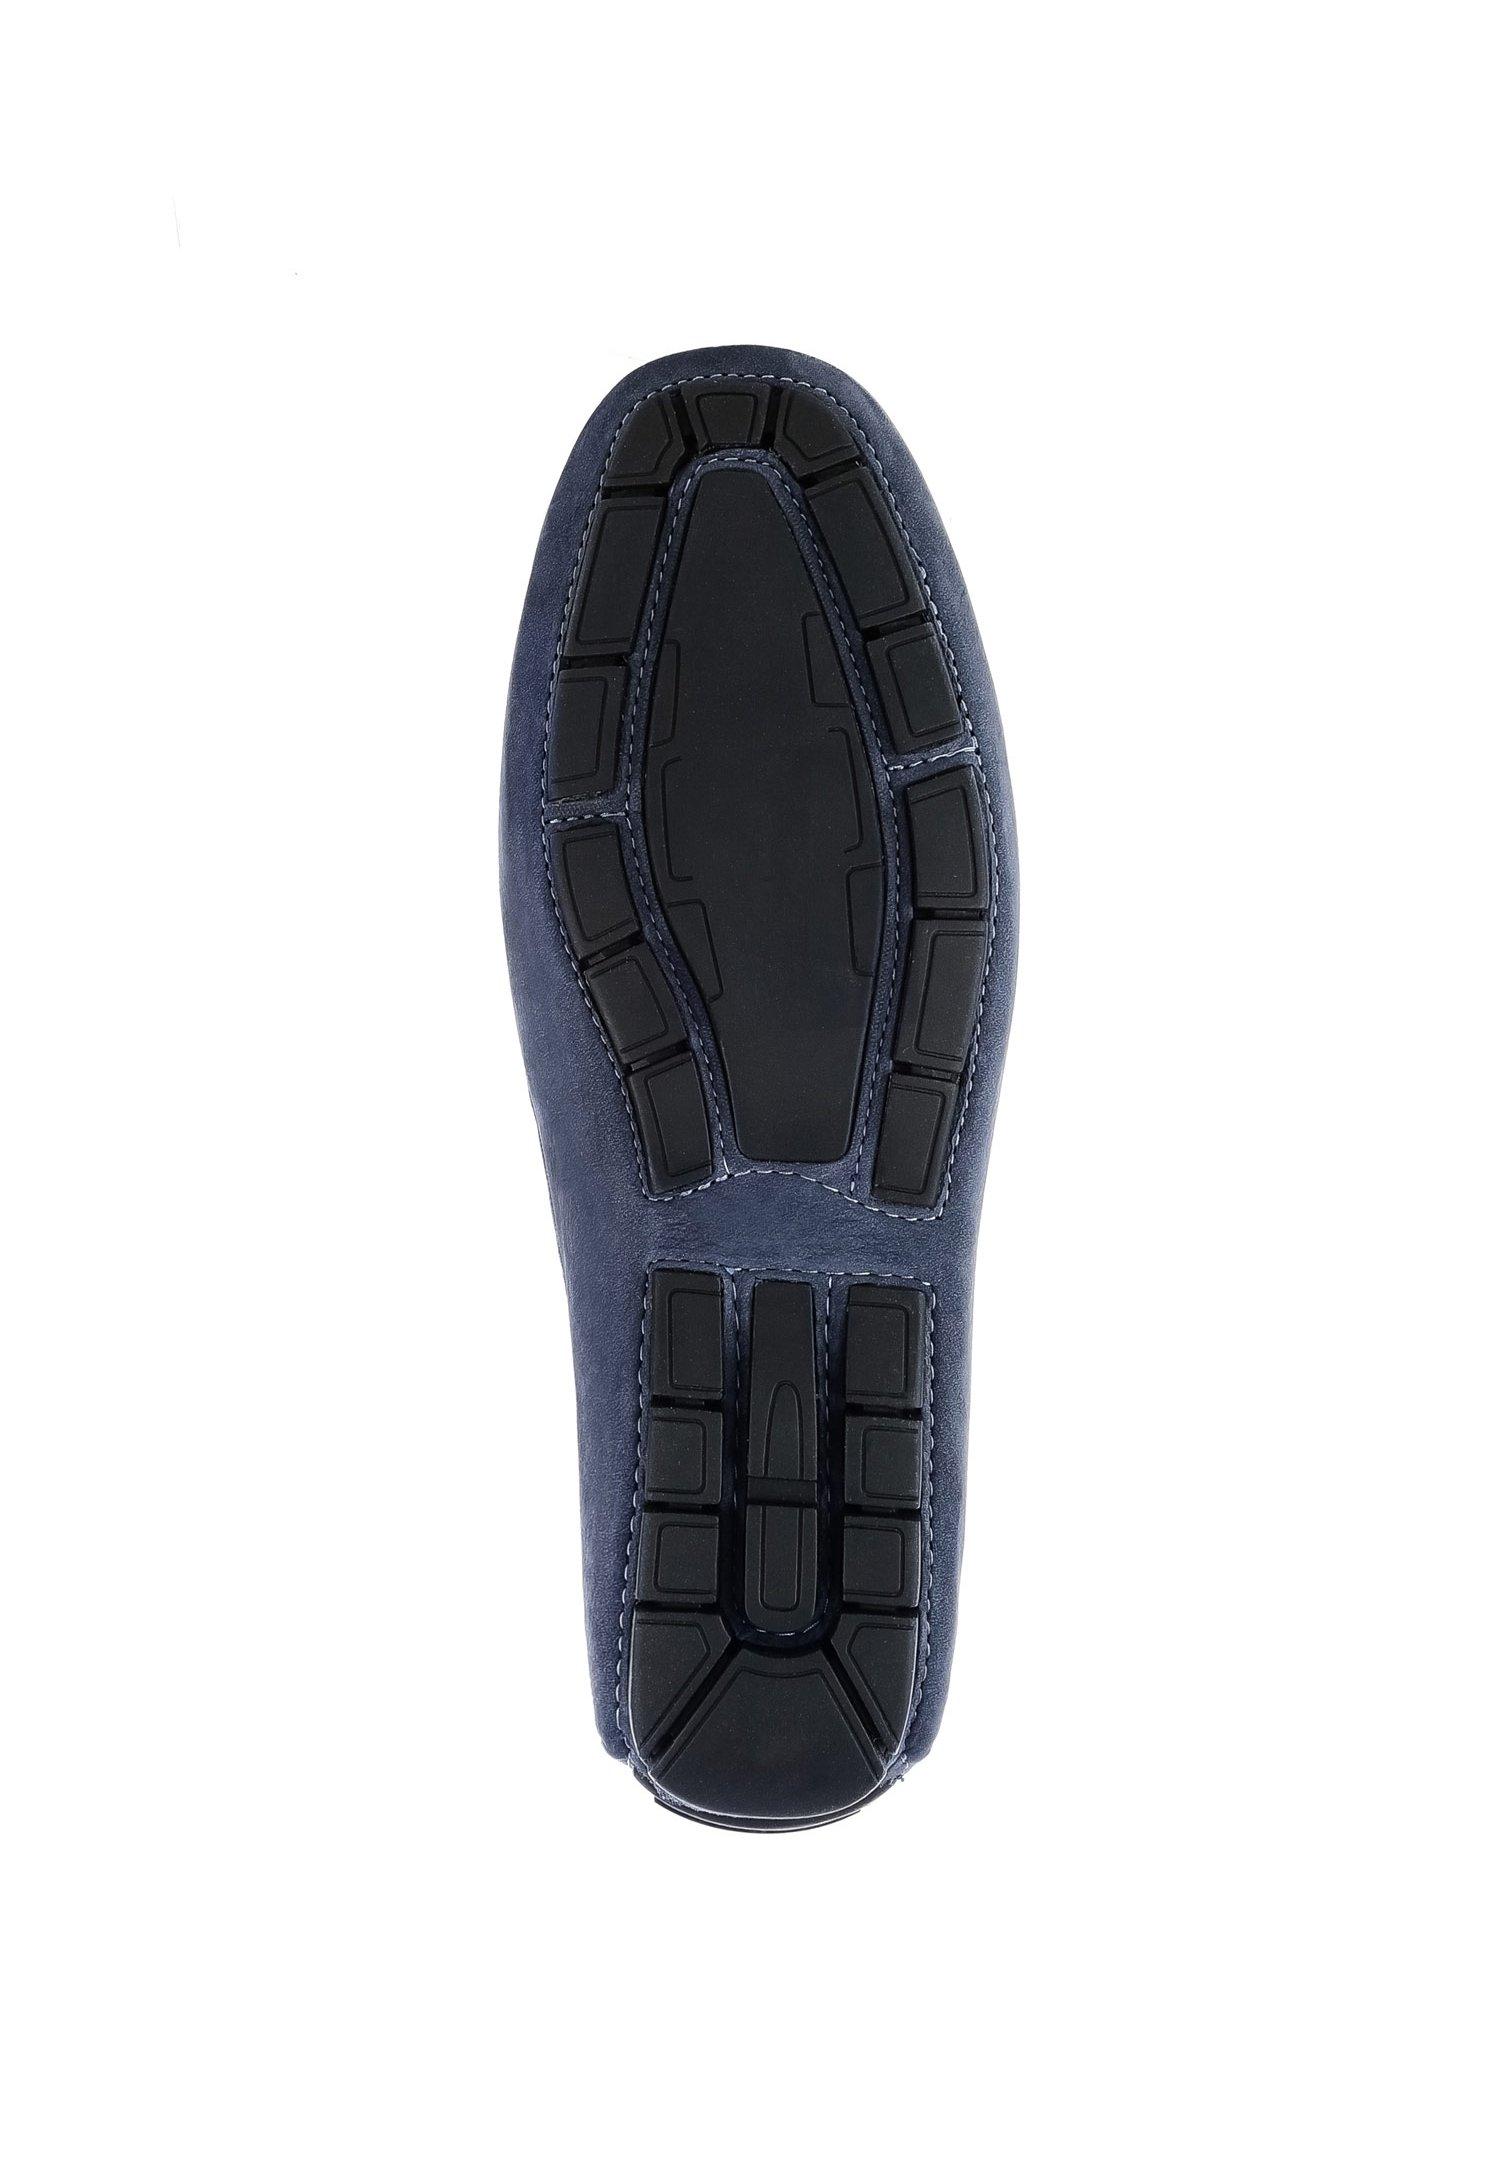 Offer Cheapest PRIMA MODA CAMINE - Moccasins - navy blue | men's shoes 2020 obNlA